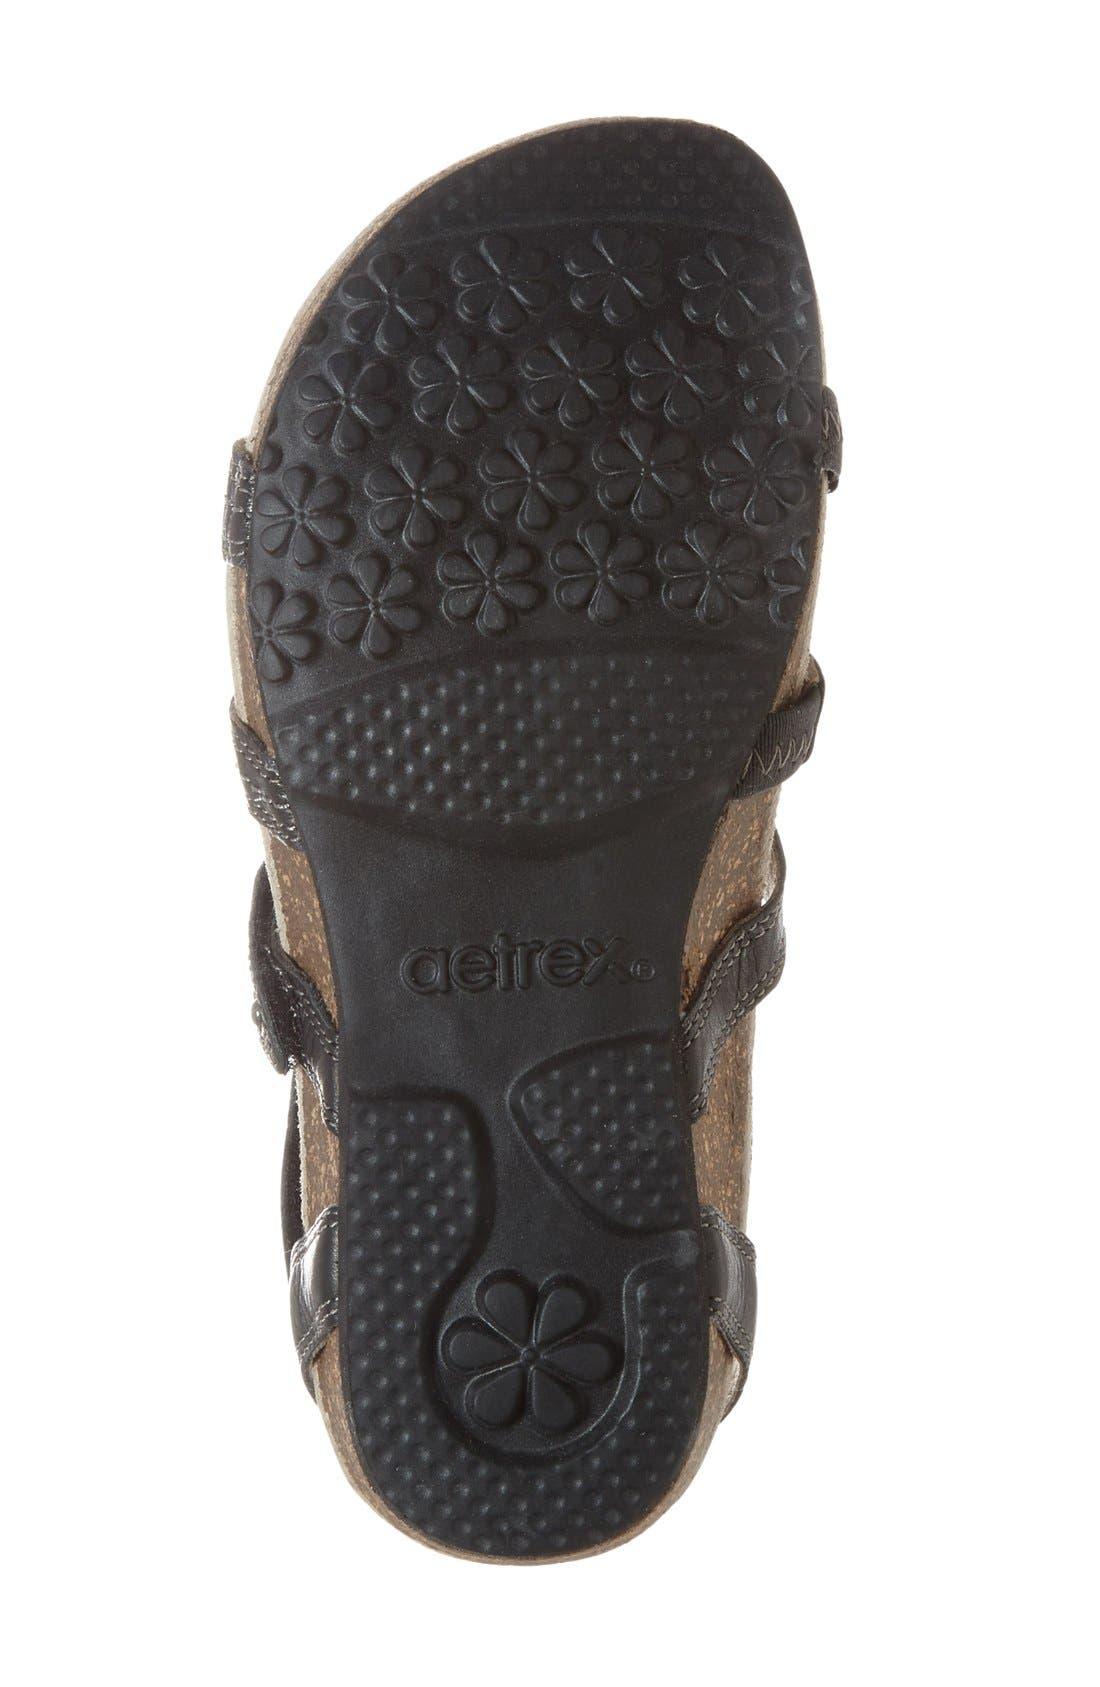 'Natasha' Gladiator Sandal,                             Alternate thumbnail 4, color,                             Black Leather